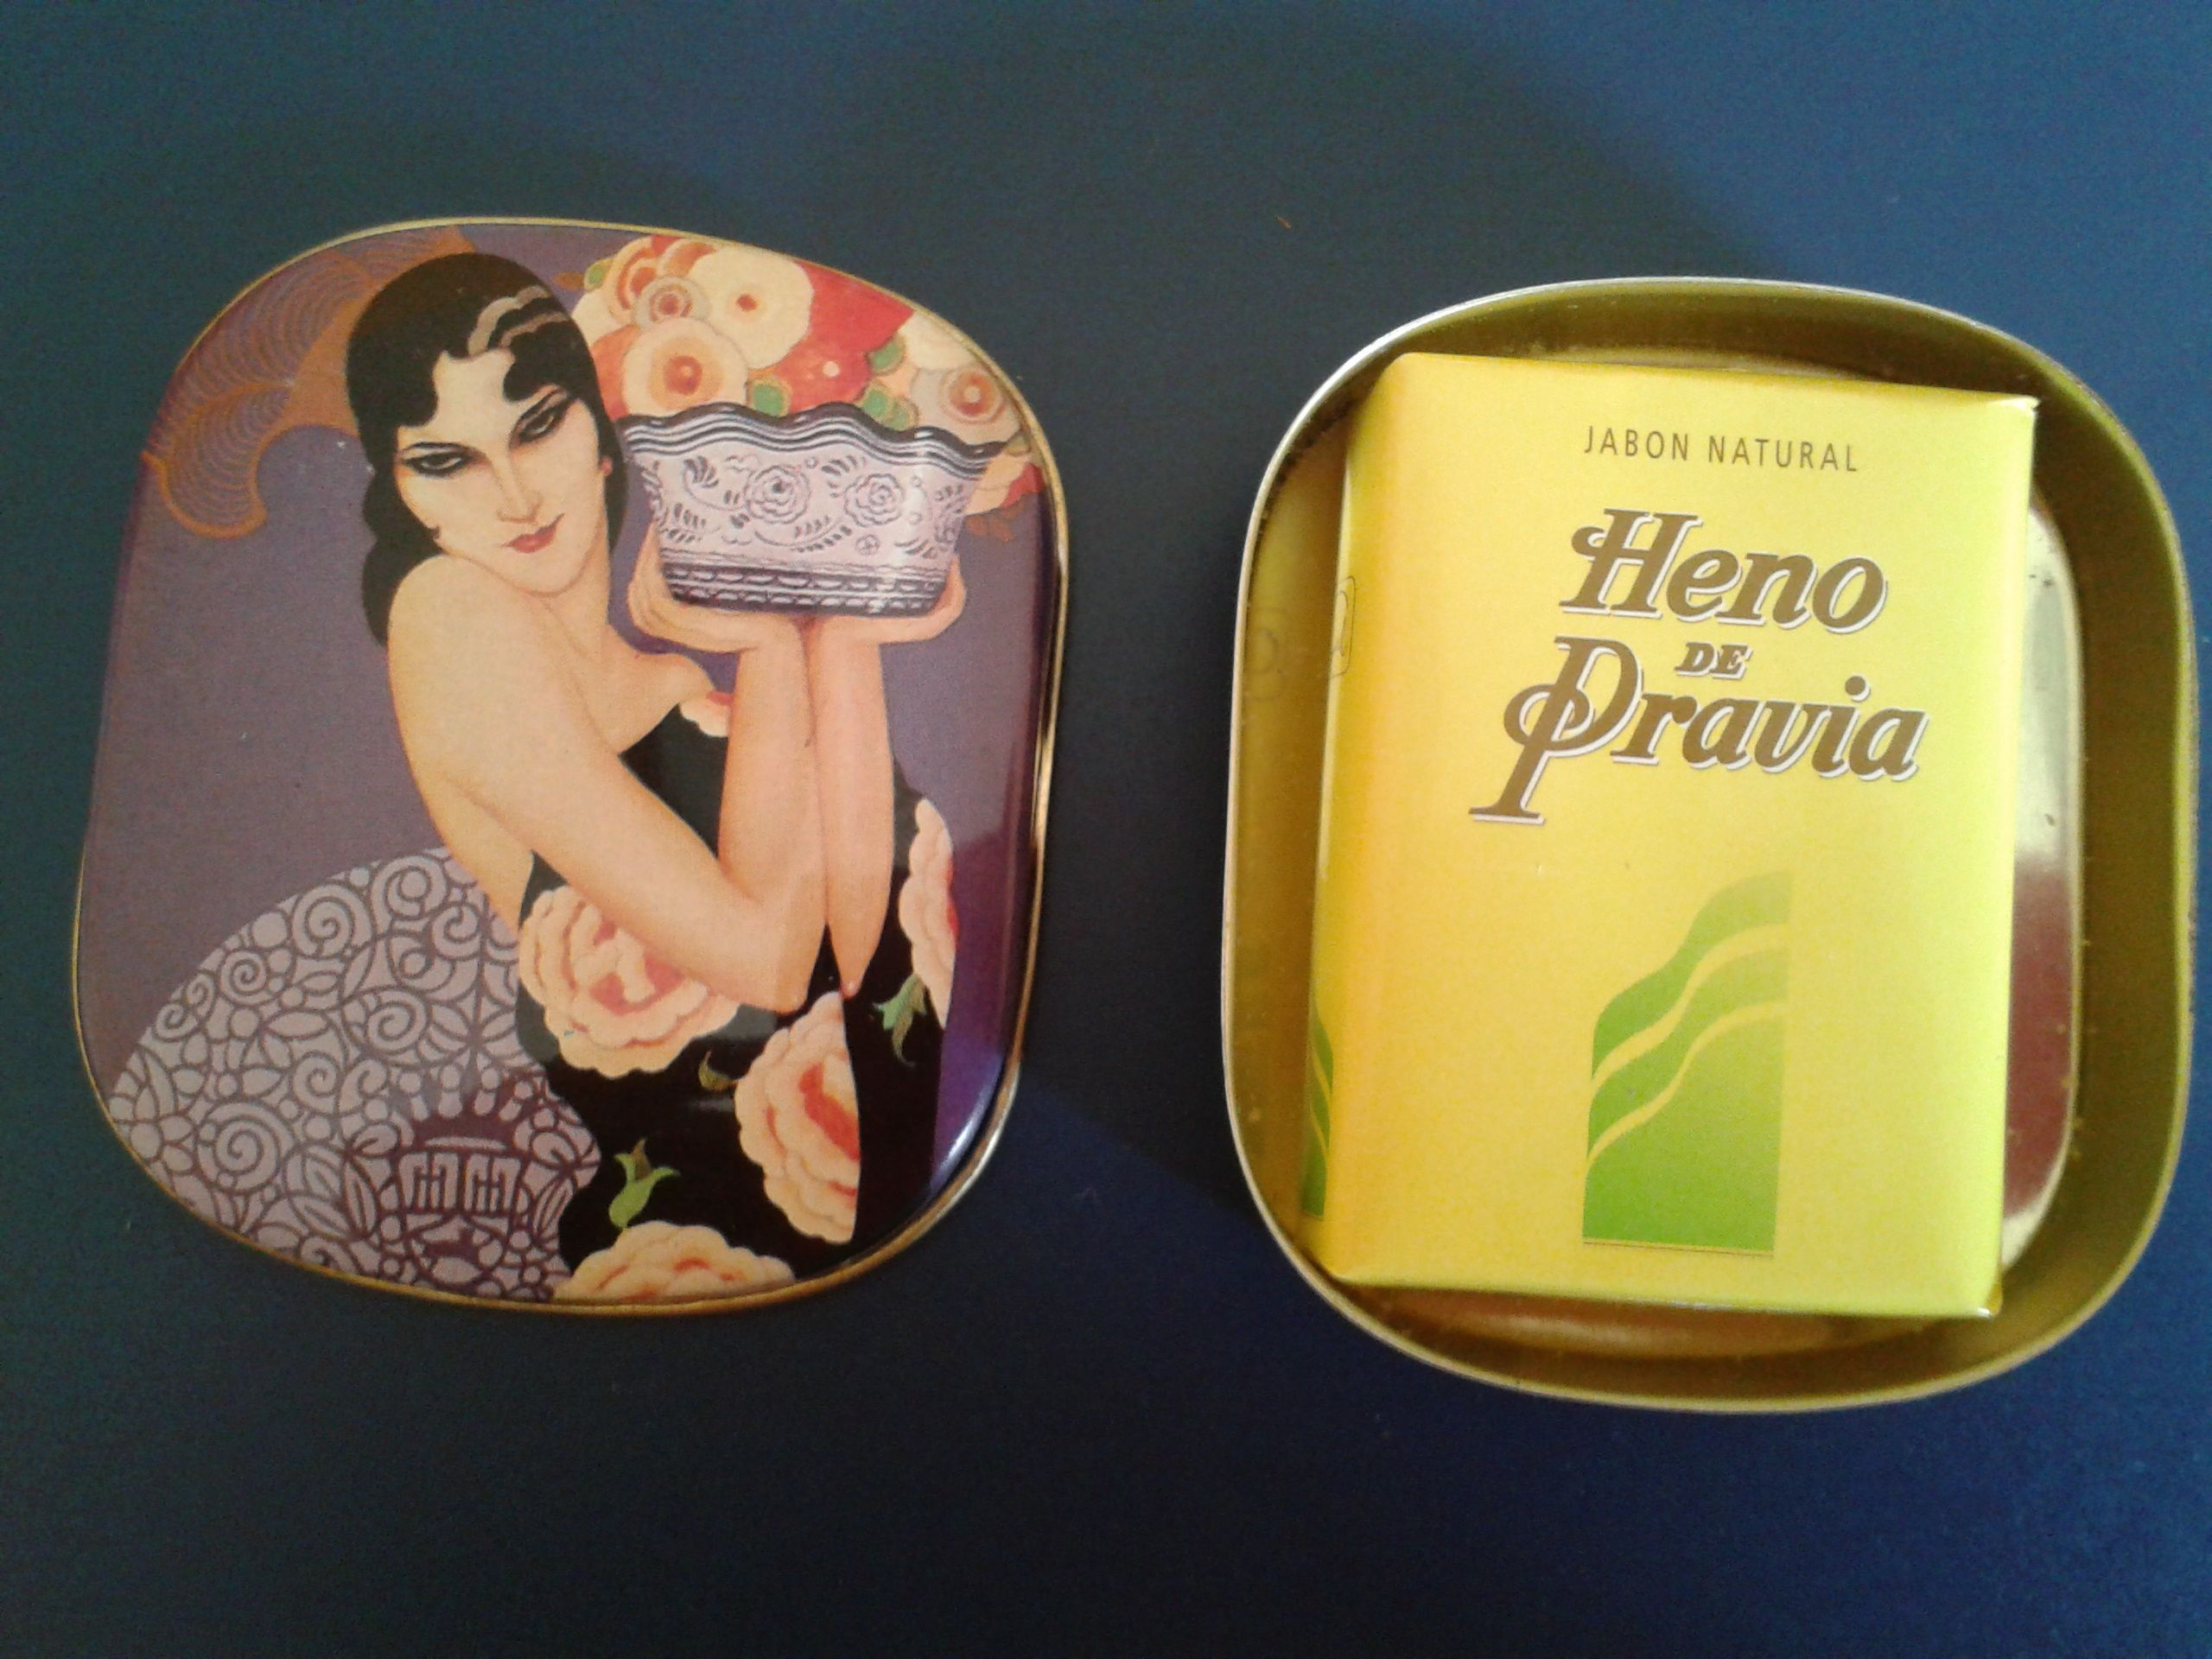 VINTAGE HENO DE PRAVIA SOAP TIN BOX GAL PERFUMERY SPAIN. Disponible en Ebay: http://www.ebay.es/itm/-/122062615927?